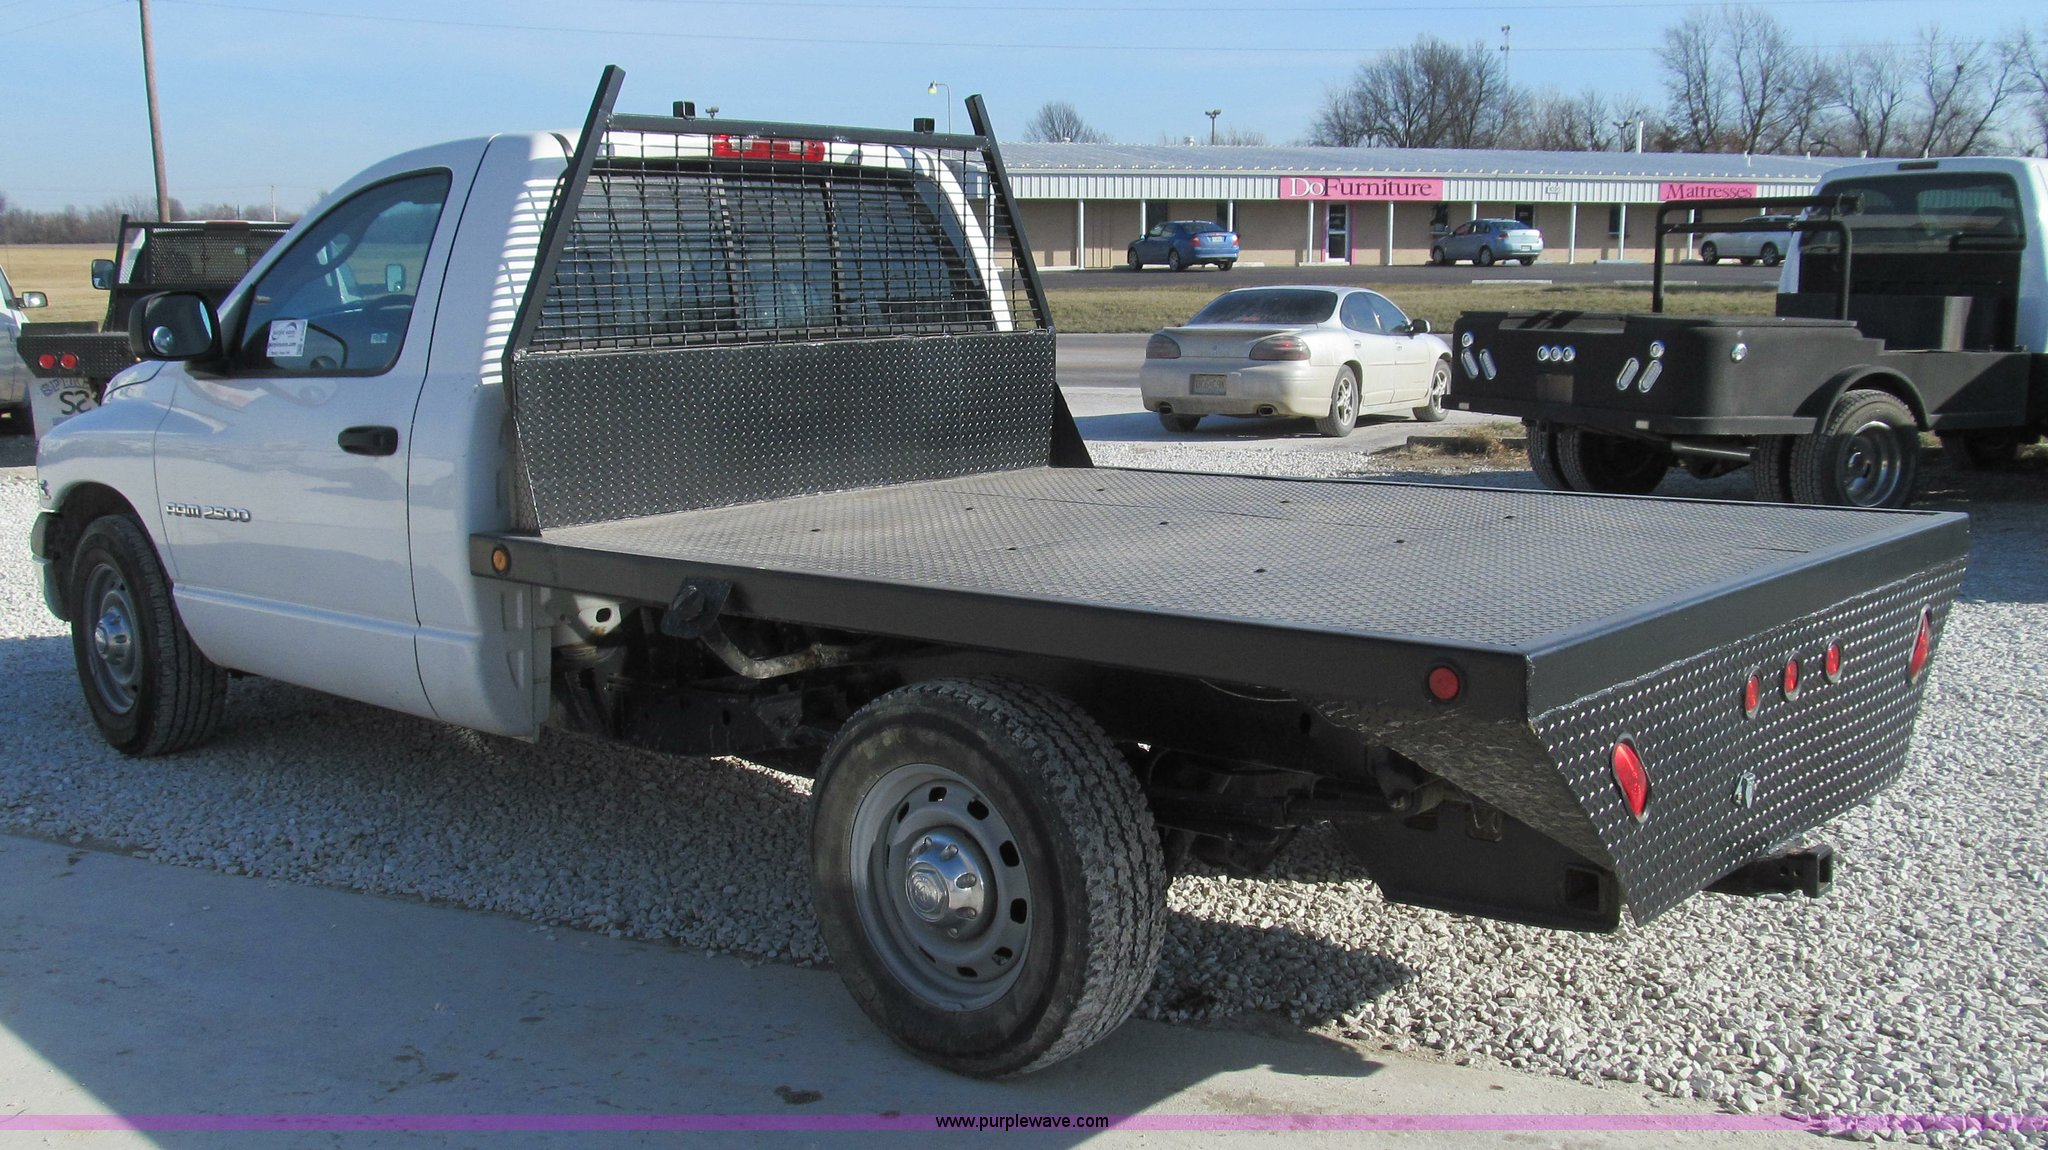 2003 Dodge Ram 2500 Flatbed Truck Item E3680 Sold Febru Full Size In New Window